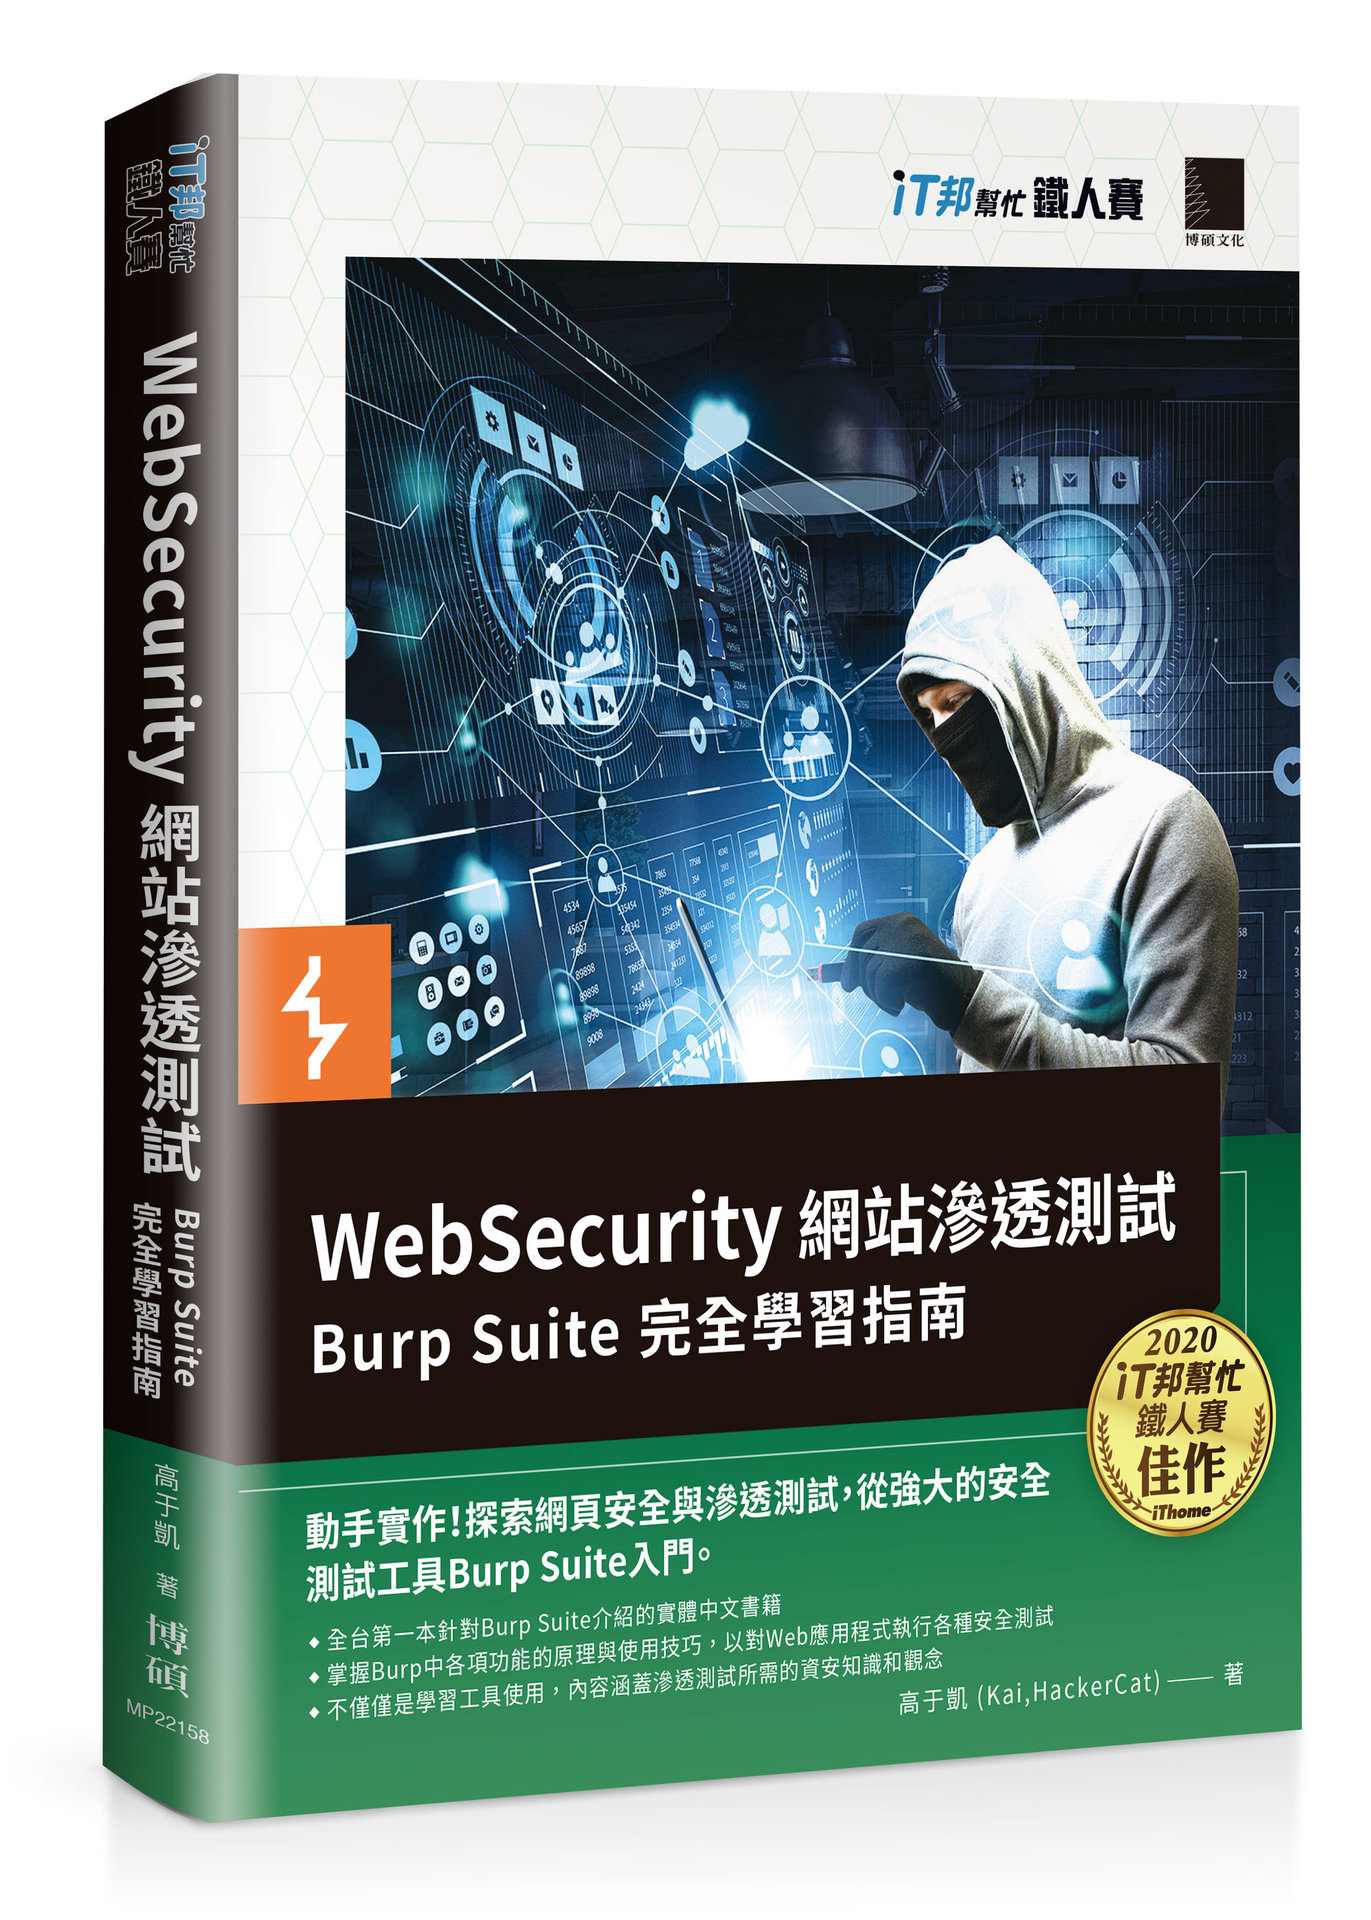 WebSecurity 網站滲透測試:Burp Suite 完全學習指南 (iT邦幫忙鐵人賽系列書)-preview-1